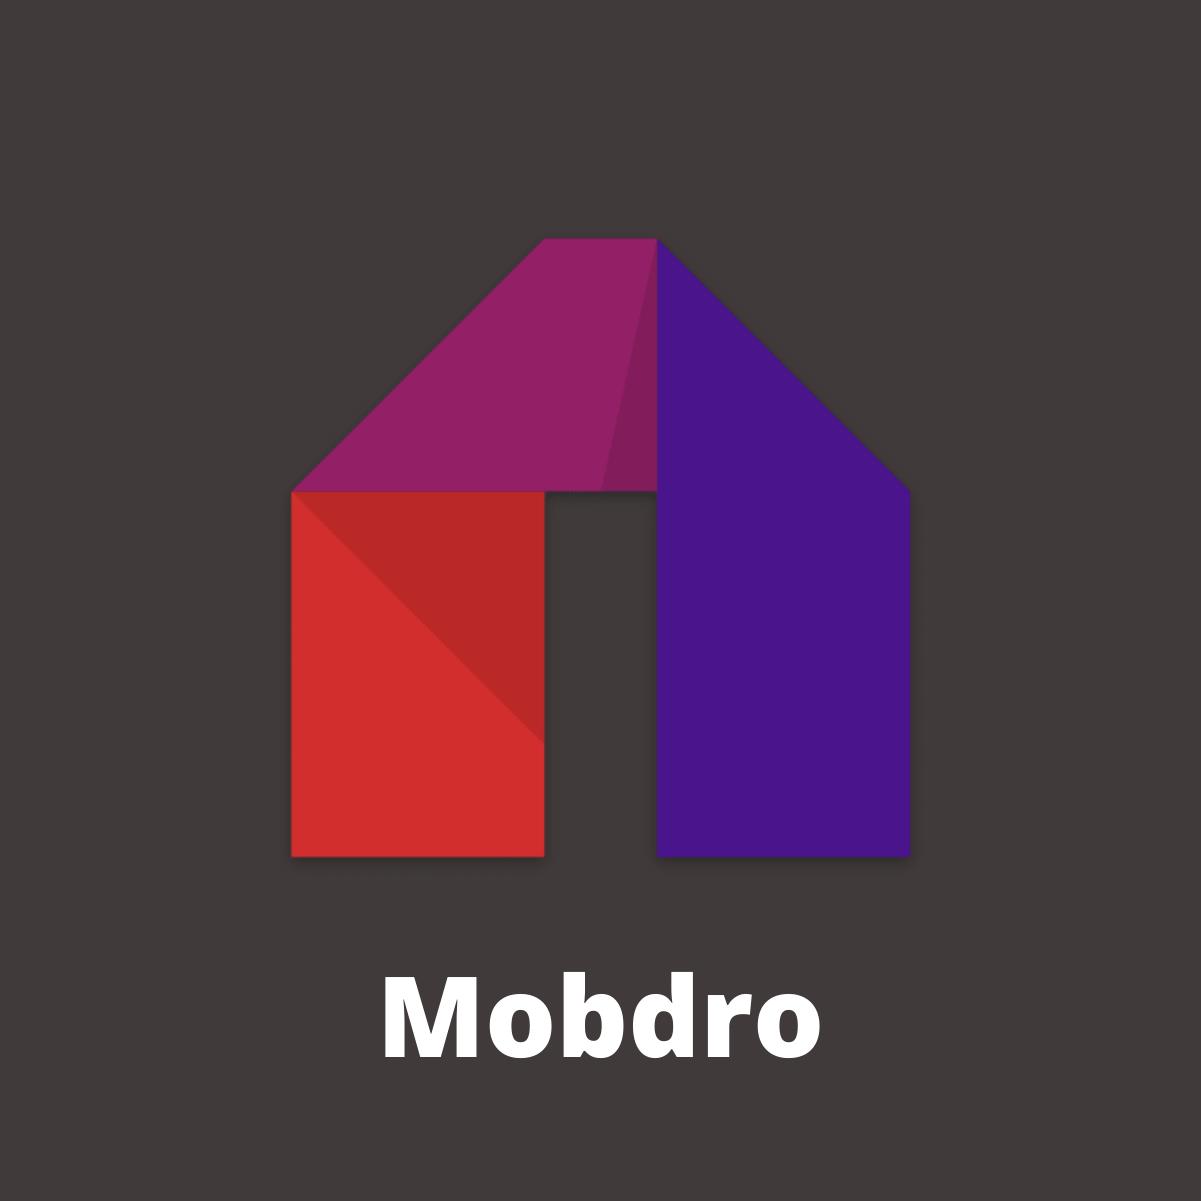 How to Install Mobdro APK on FireStick/Fire TV (Sep. 8)